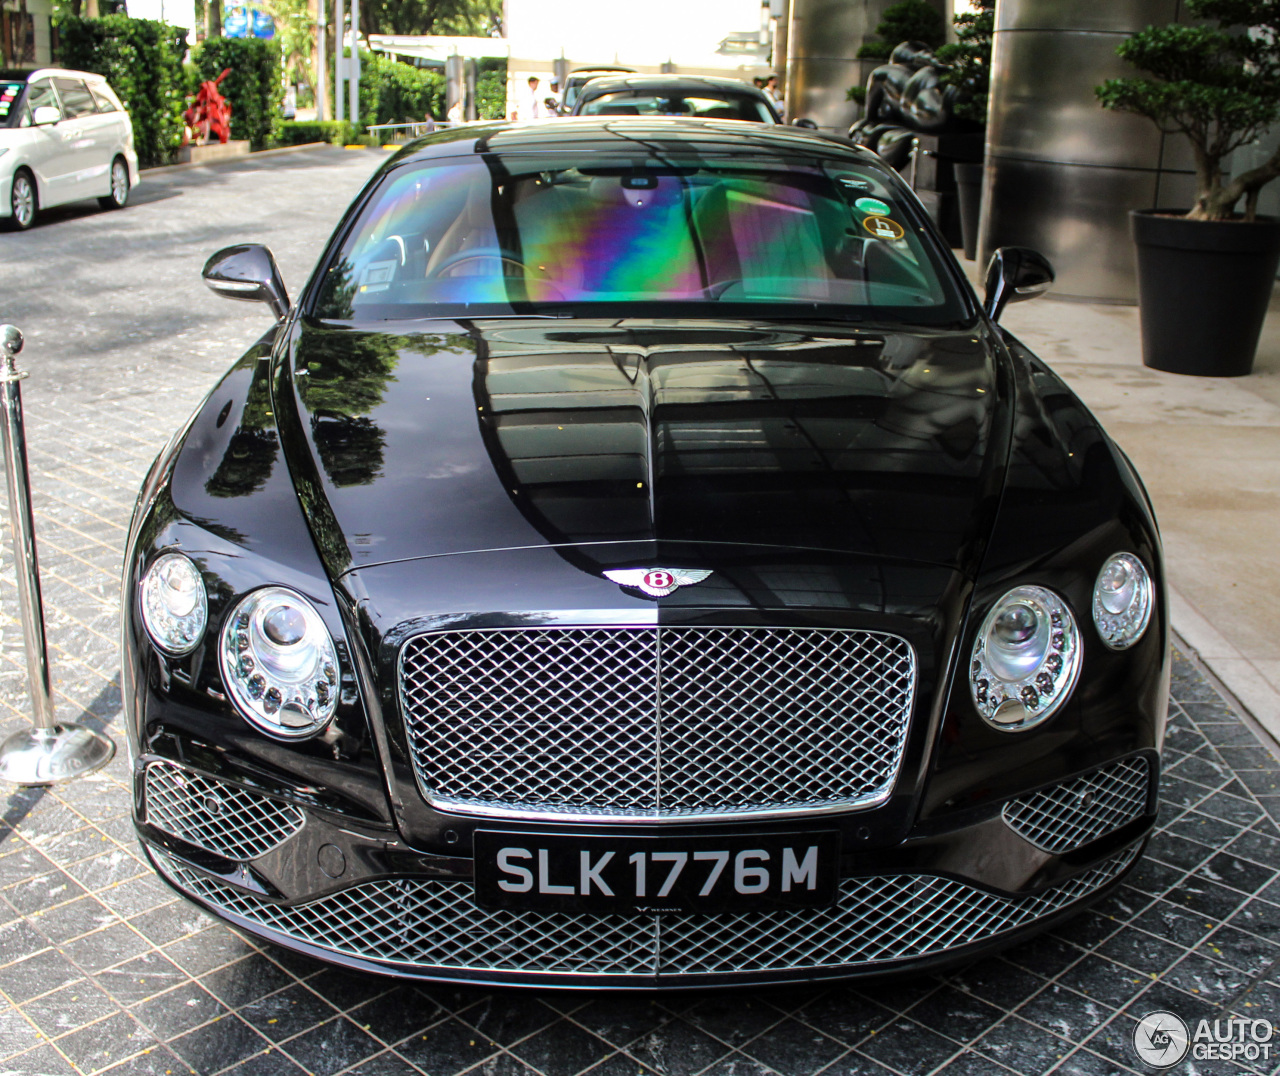 2019 Bentley Continental Gt W12 Convertible New Release: Bentley Continental GT V8 2016